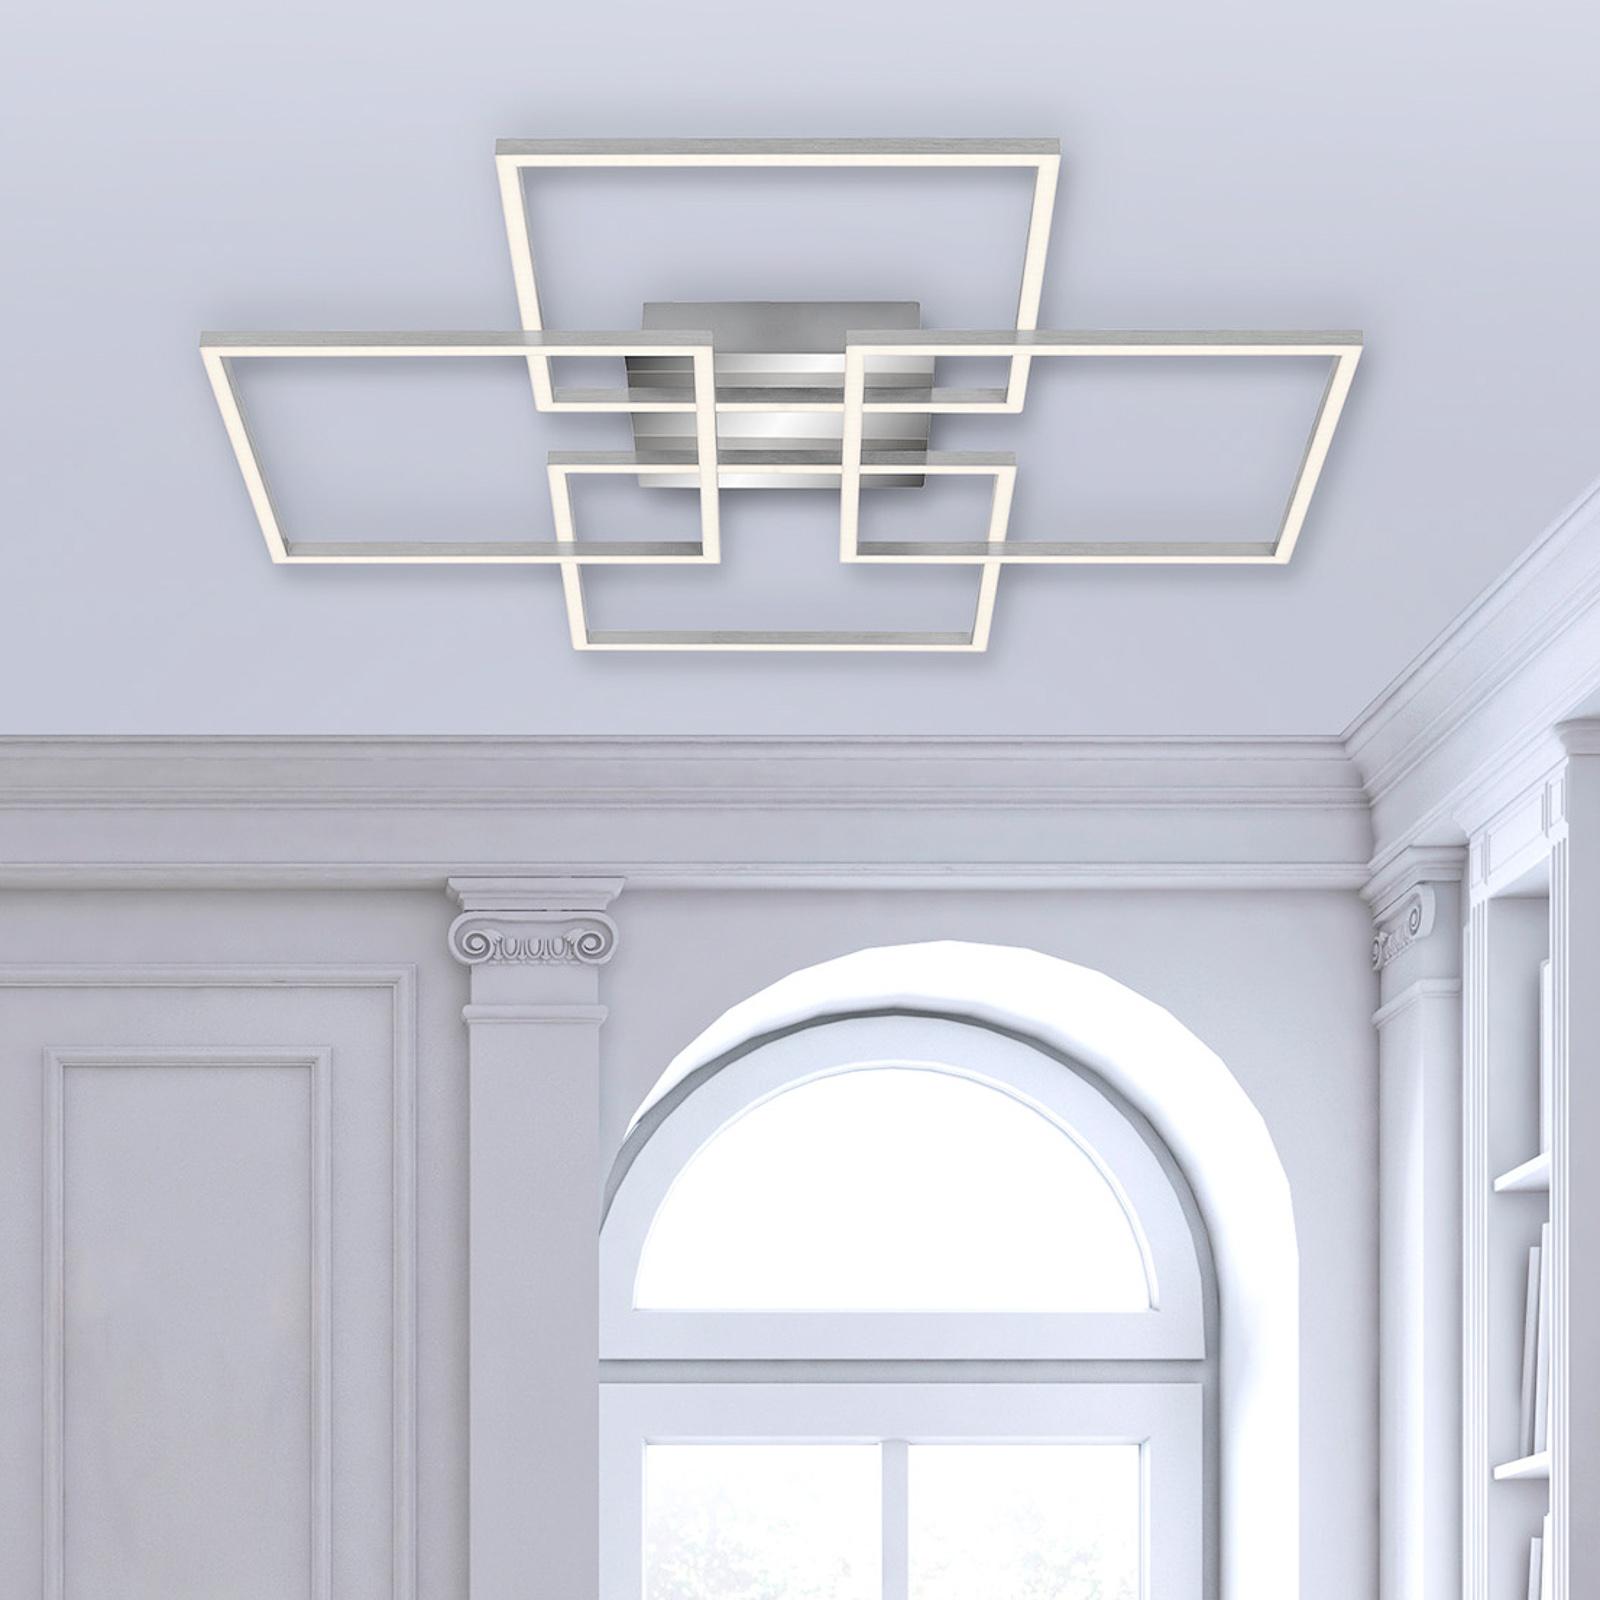 LED-Deckenleuchte Frames, 4 Quadrate, drehbar